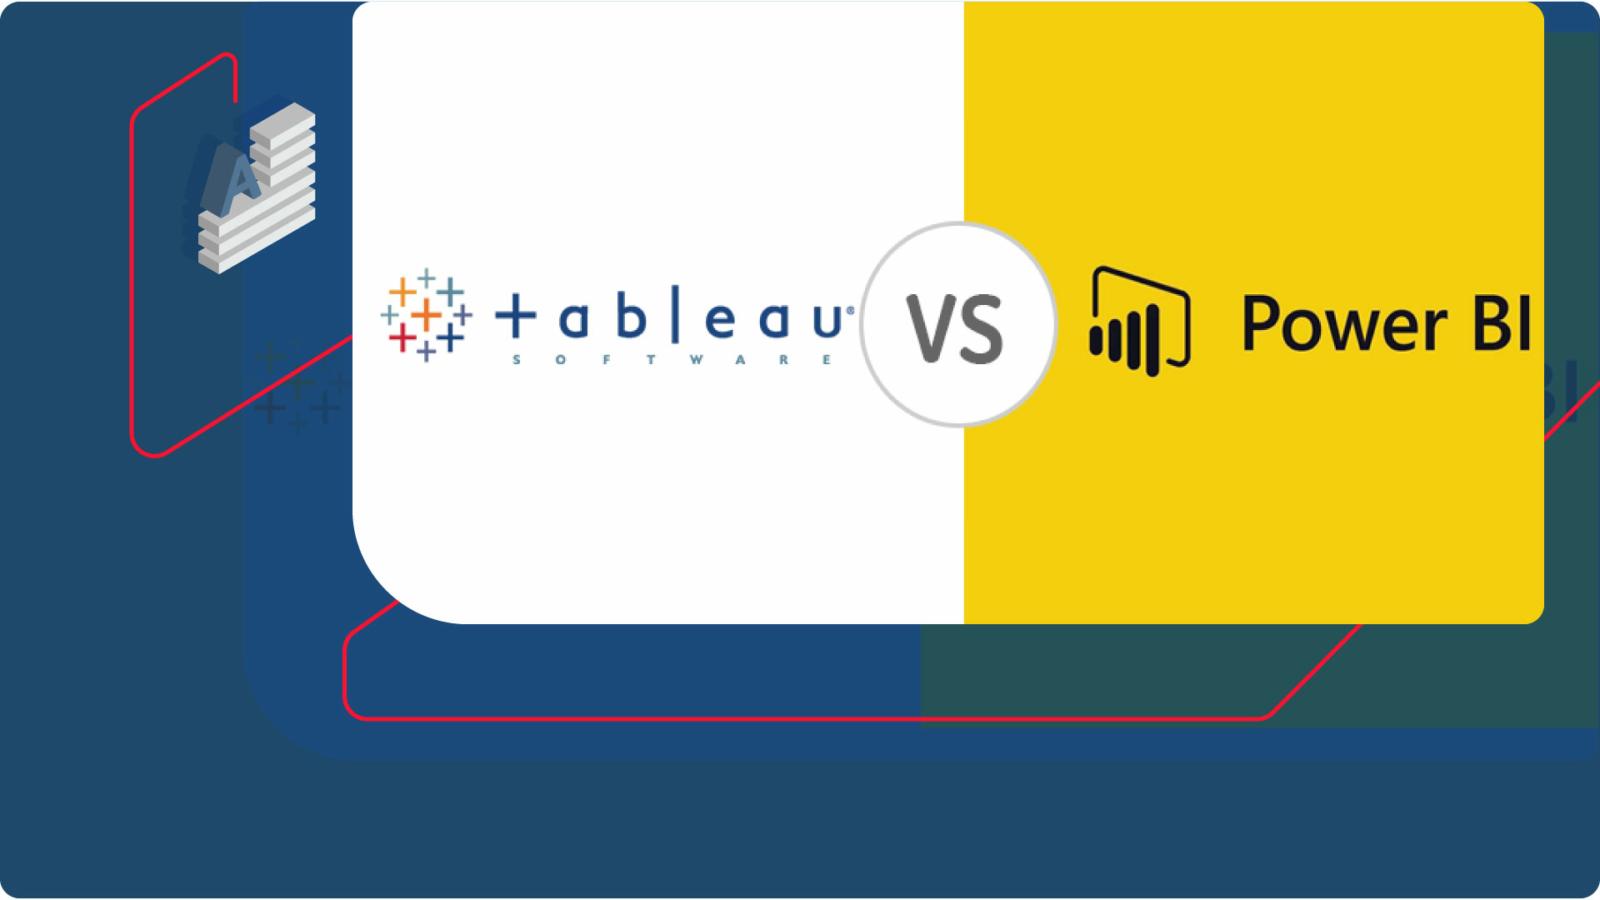 Blog-Poster-comparative-tableau-vs-powerbi